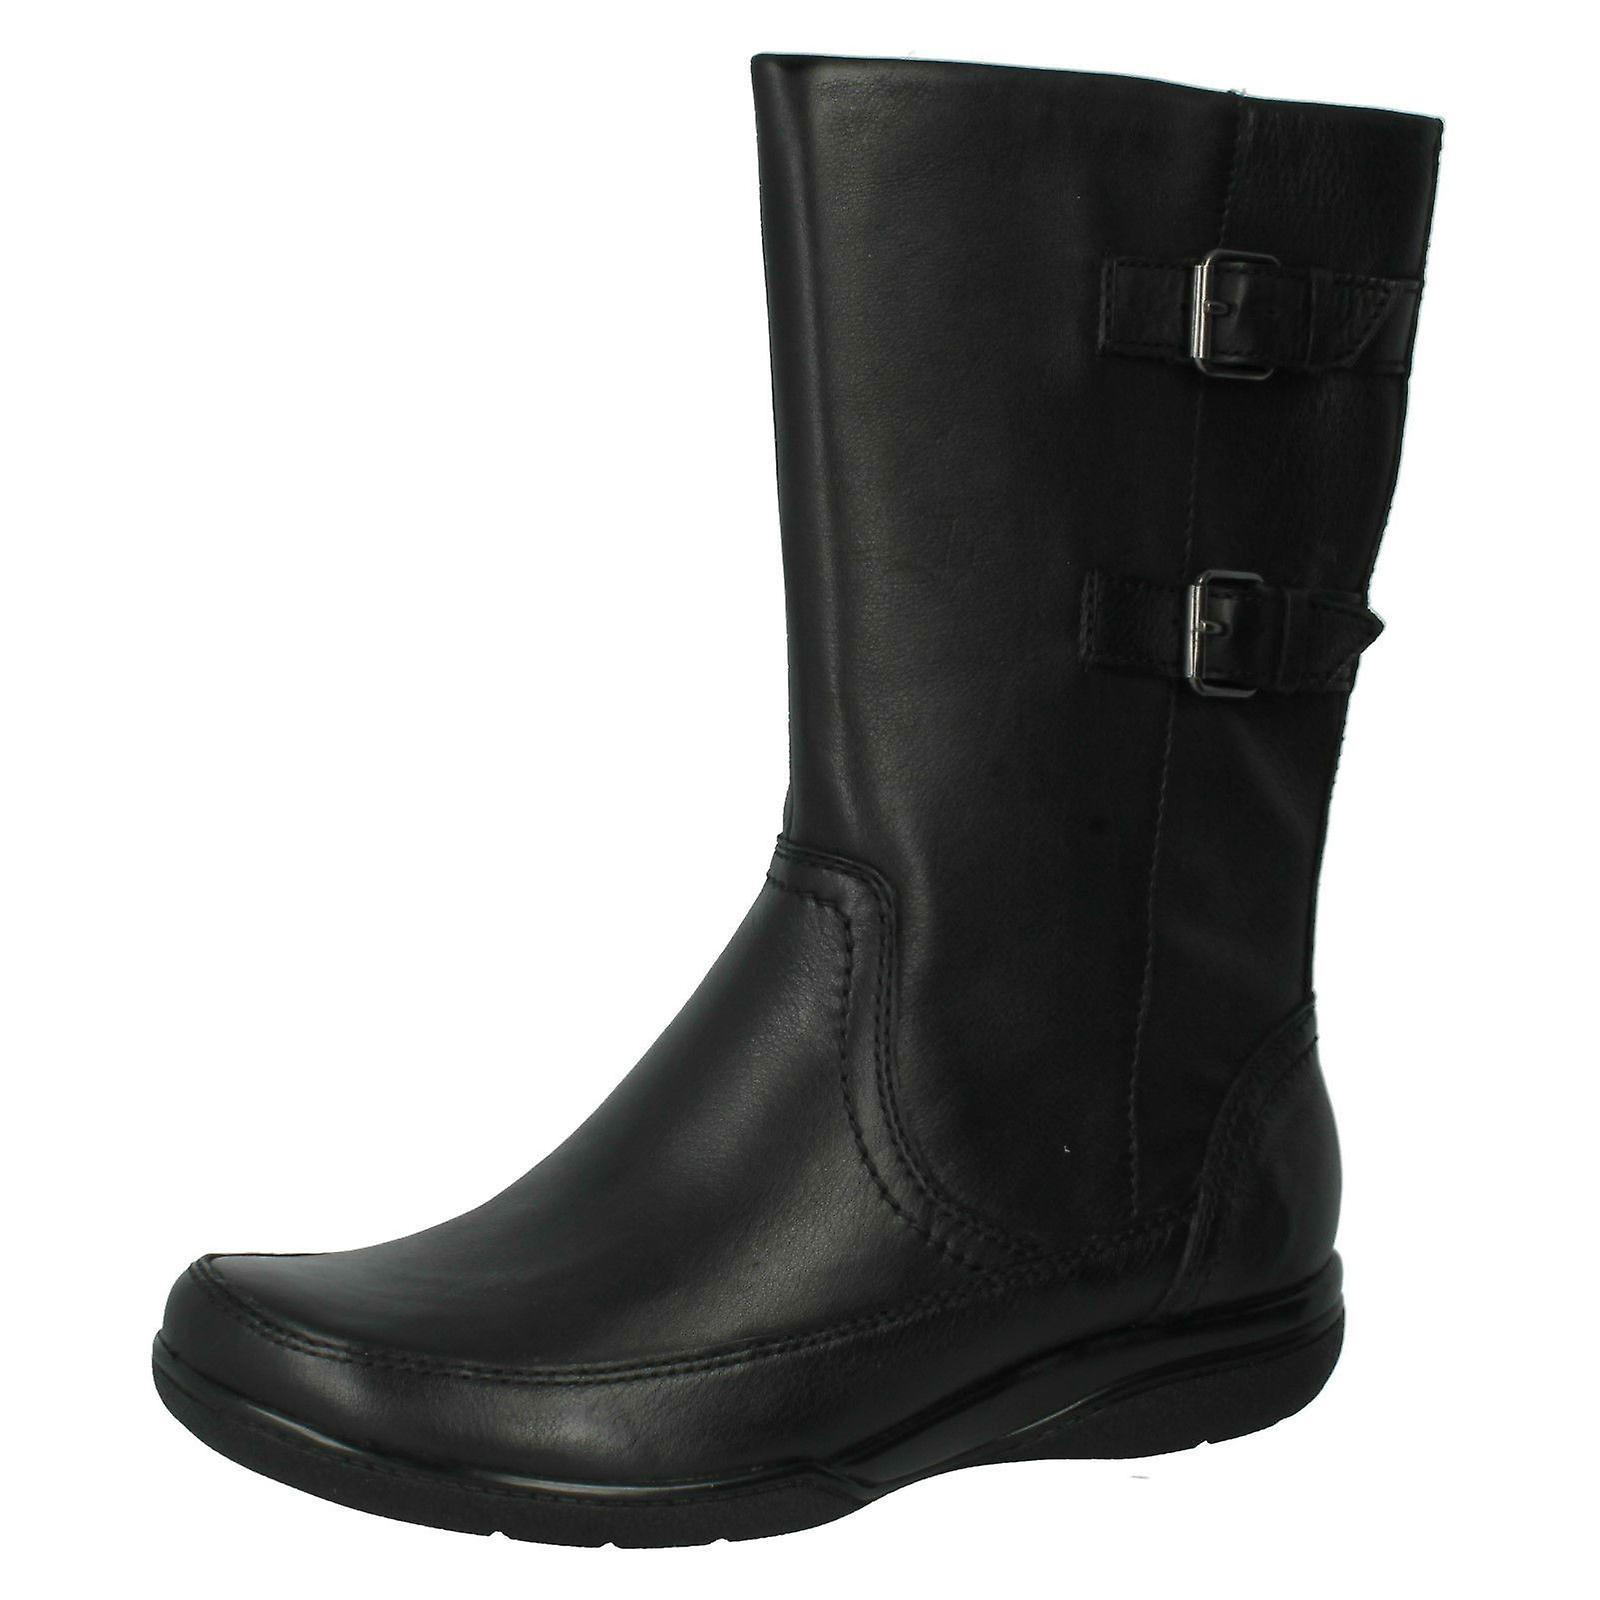 Ladies Clarks Knee High Boots Kearns Rain j54pt